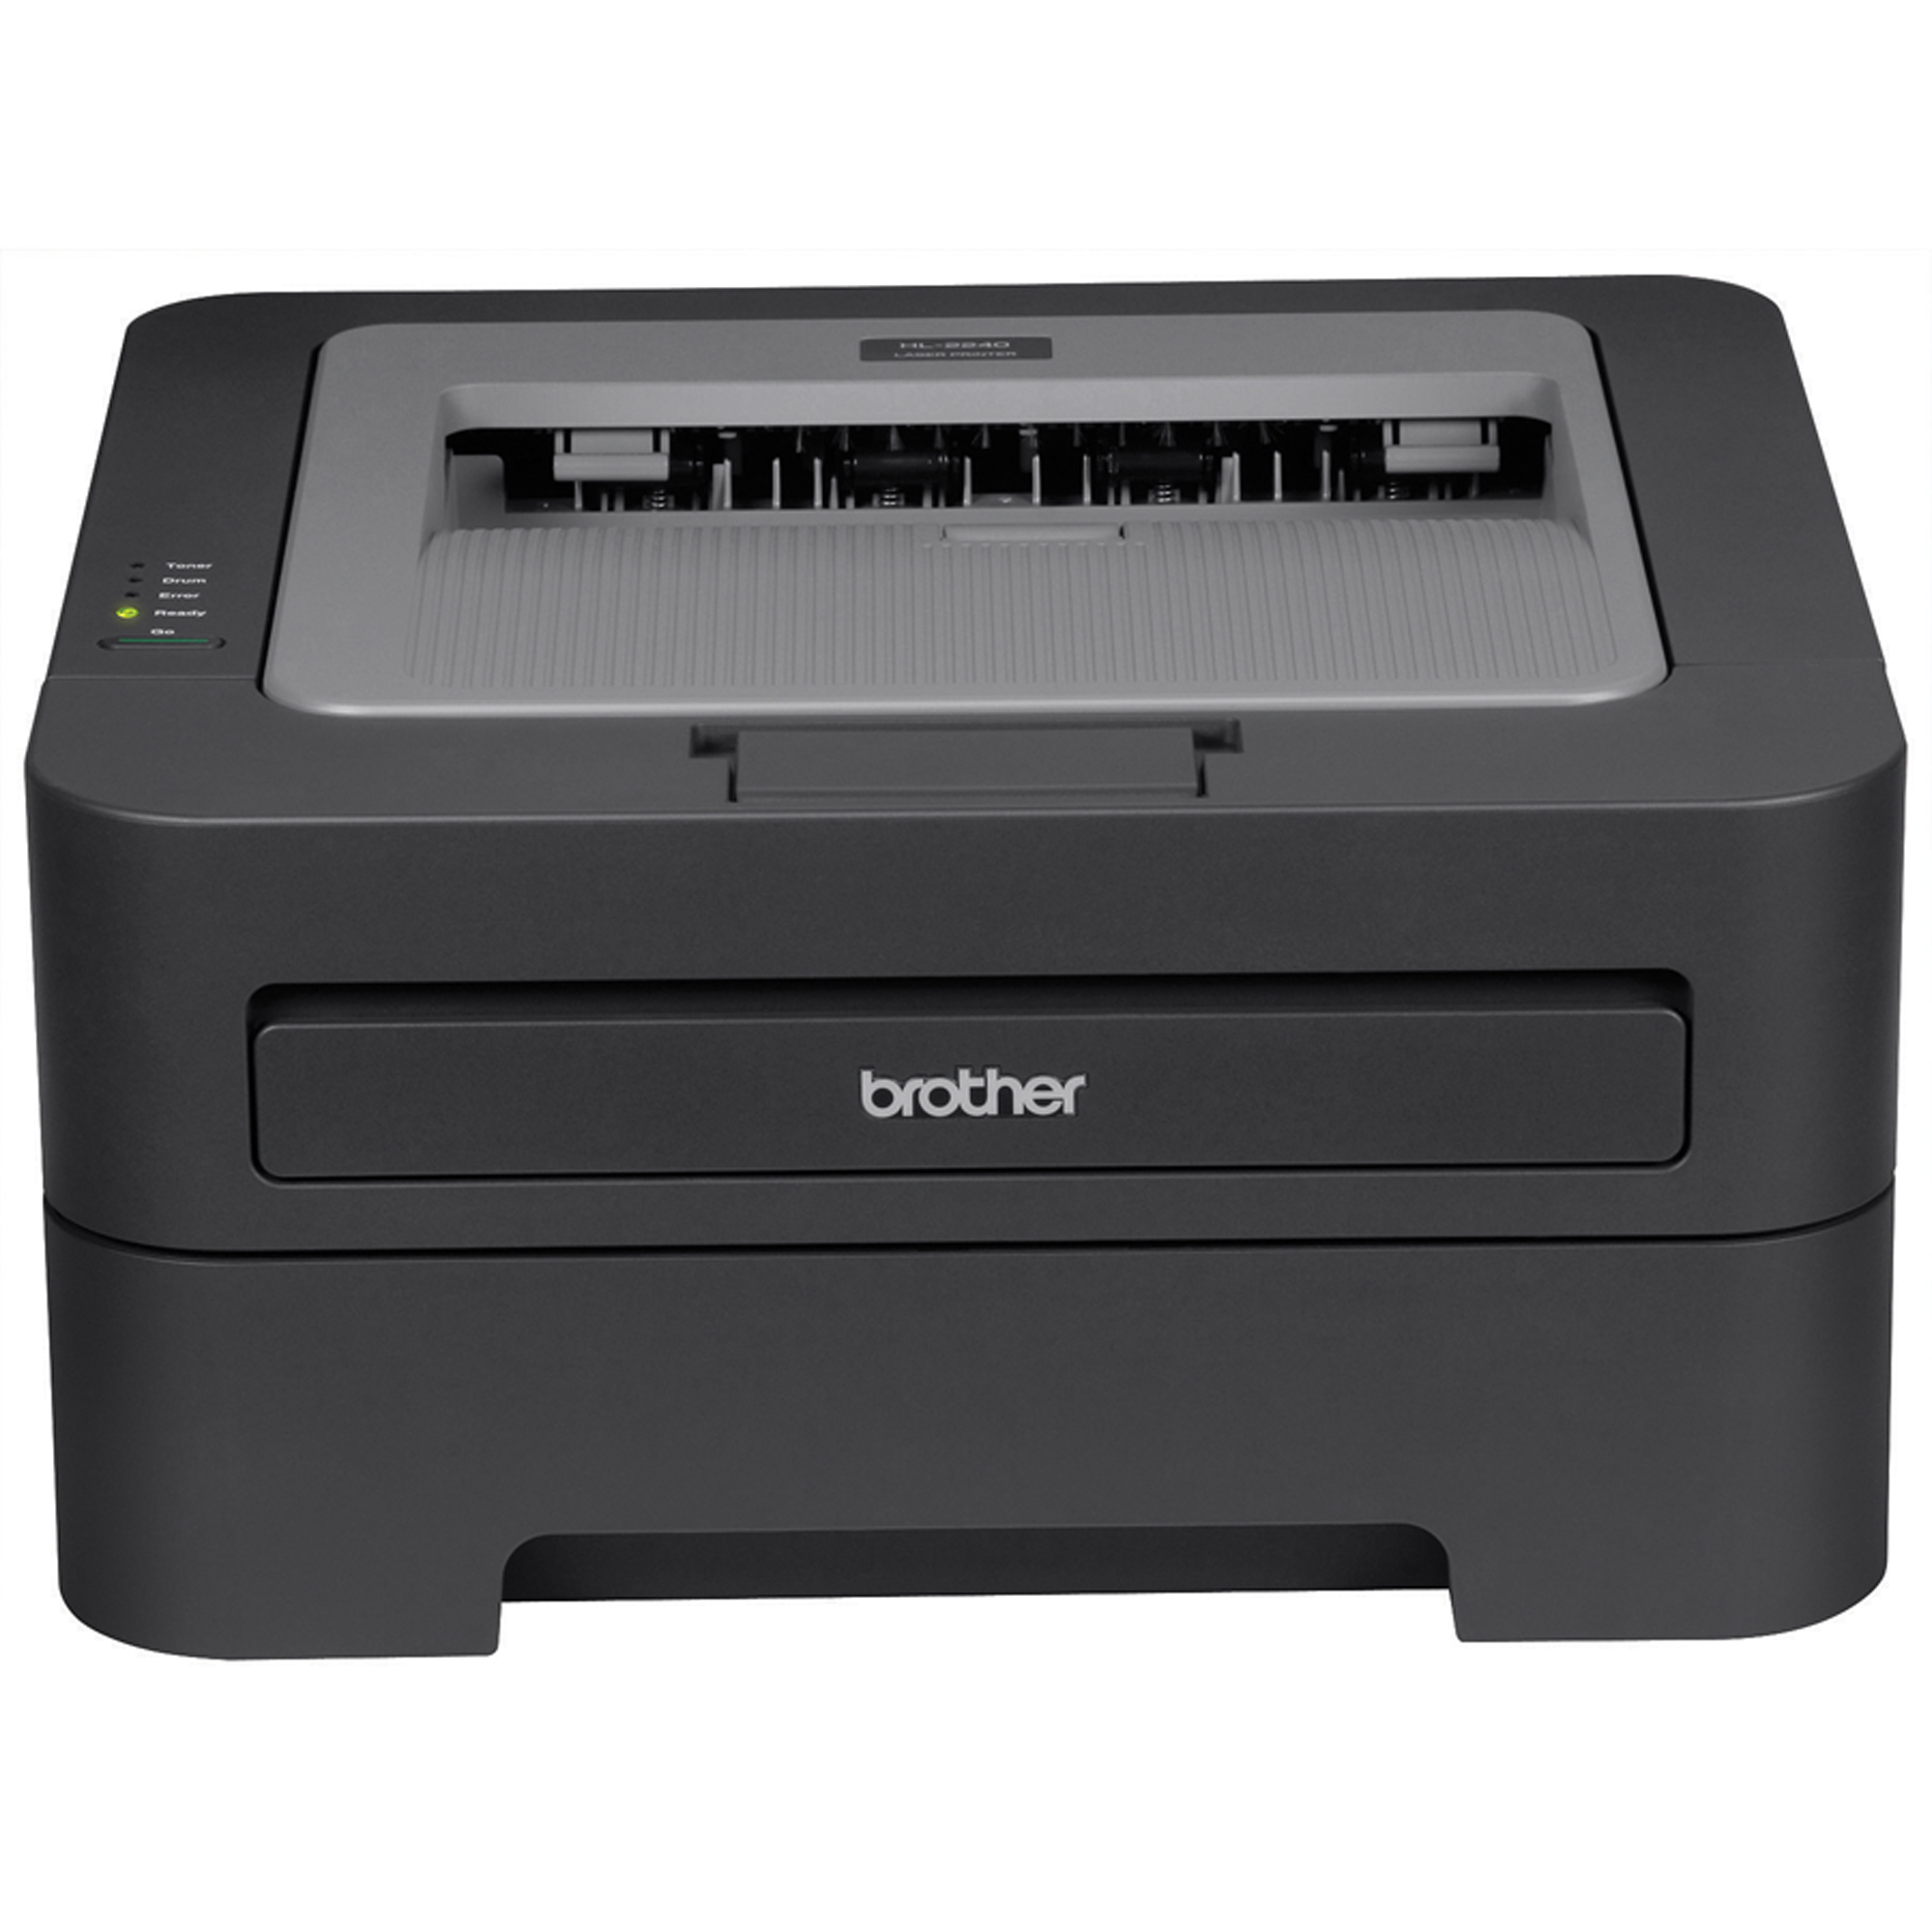 Brother® HL-2240 Monochrome Laser Printer